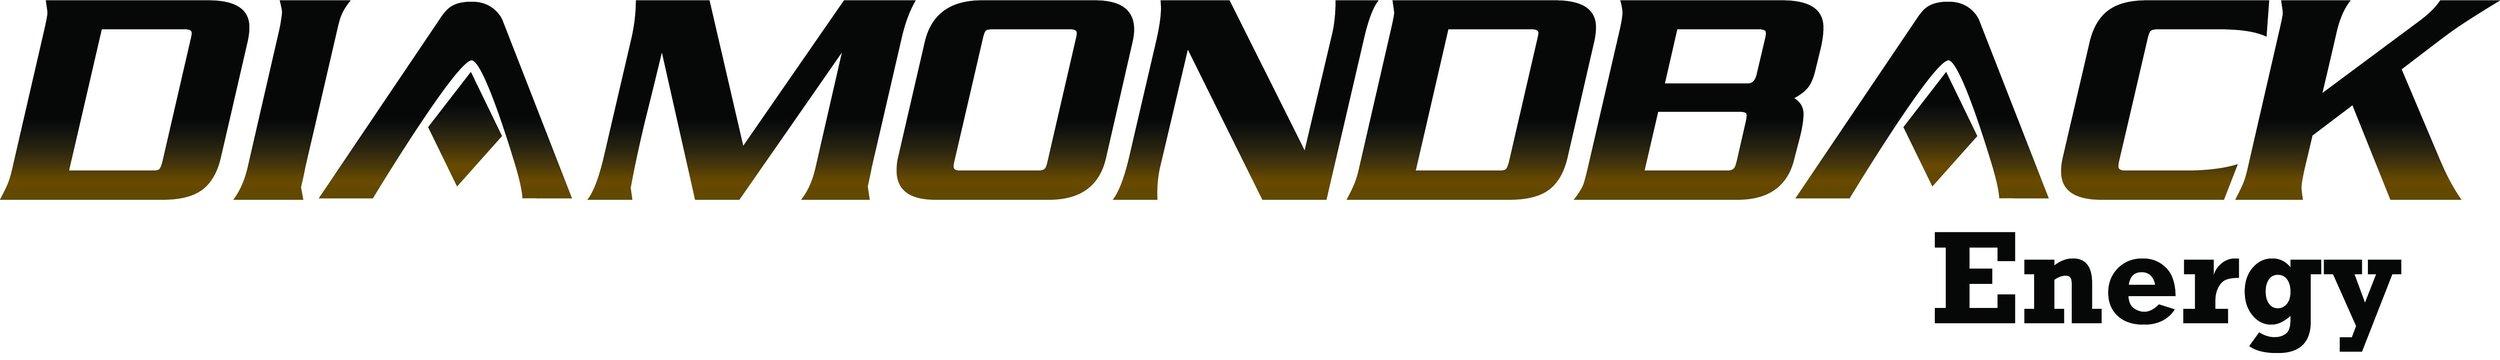 Diamondback Energy logo.jpg